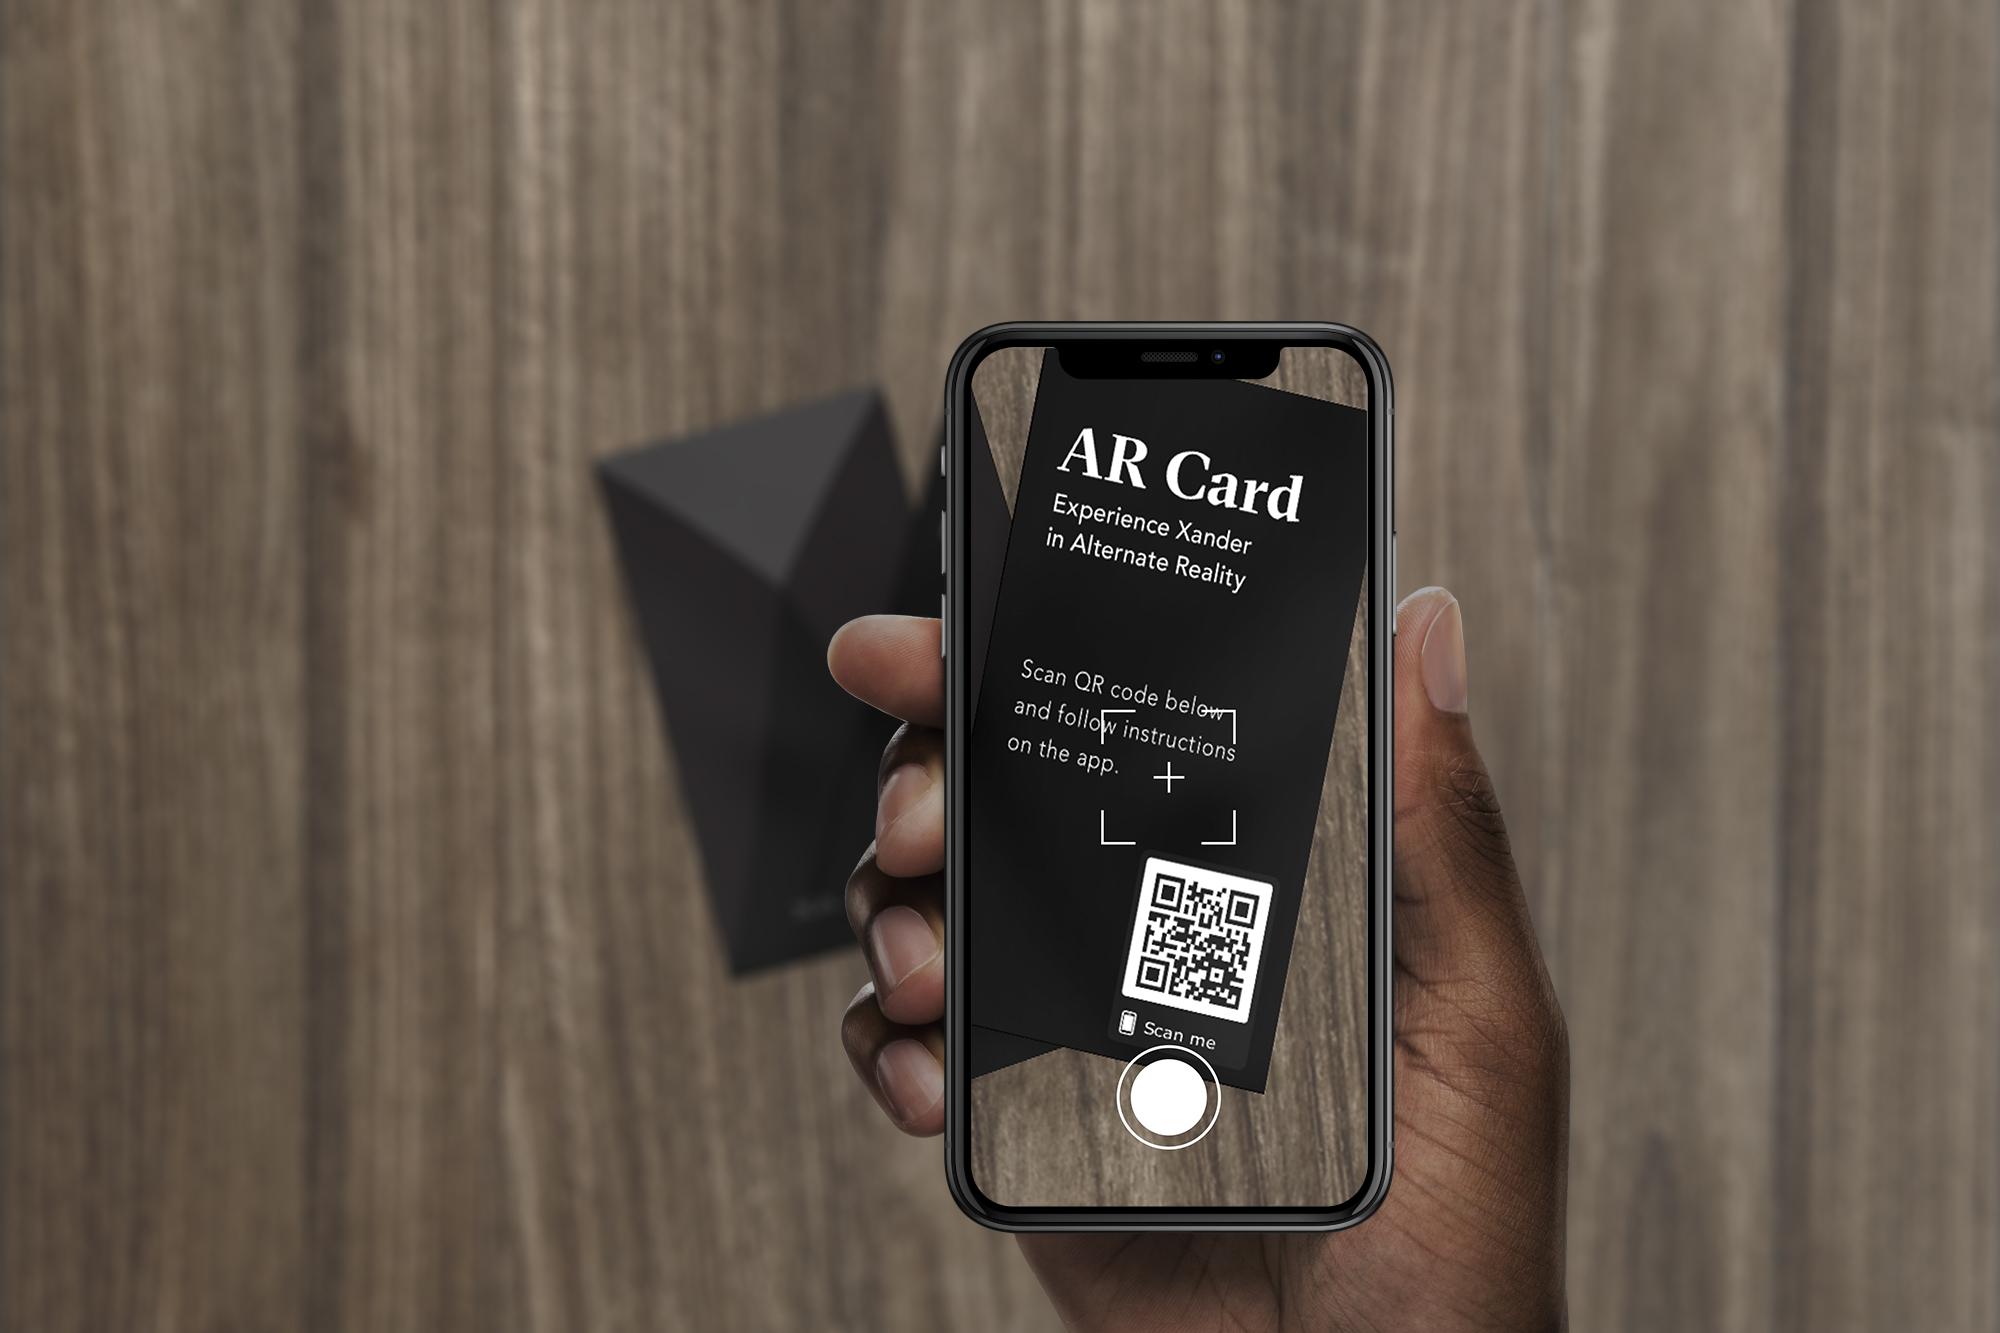 Ar Card Mockup1.jpg